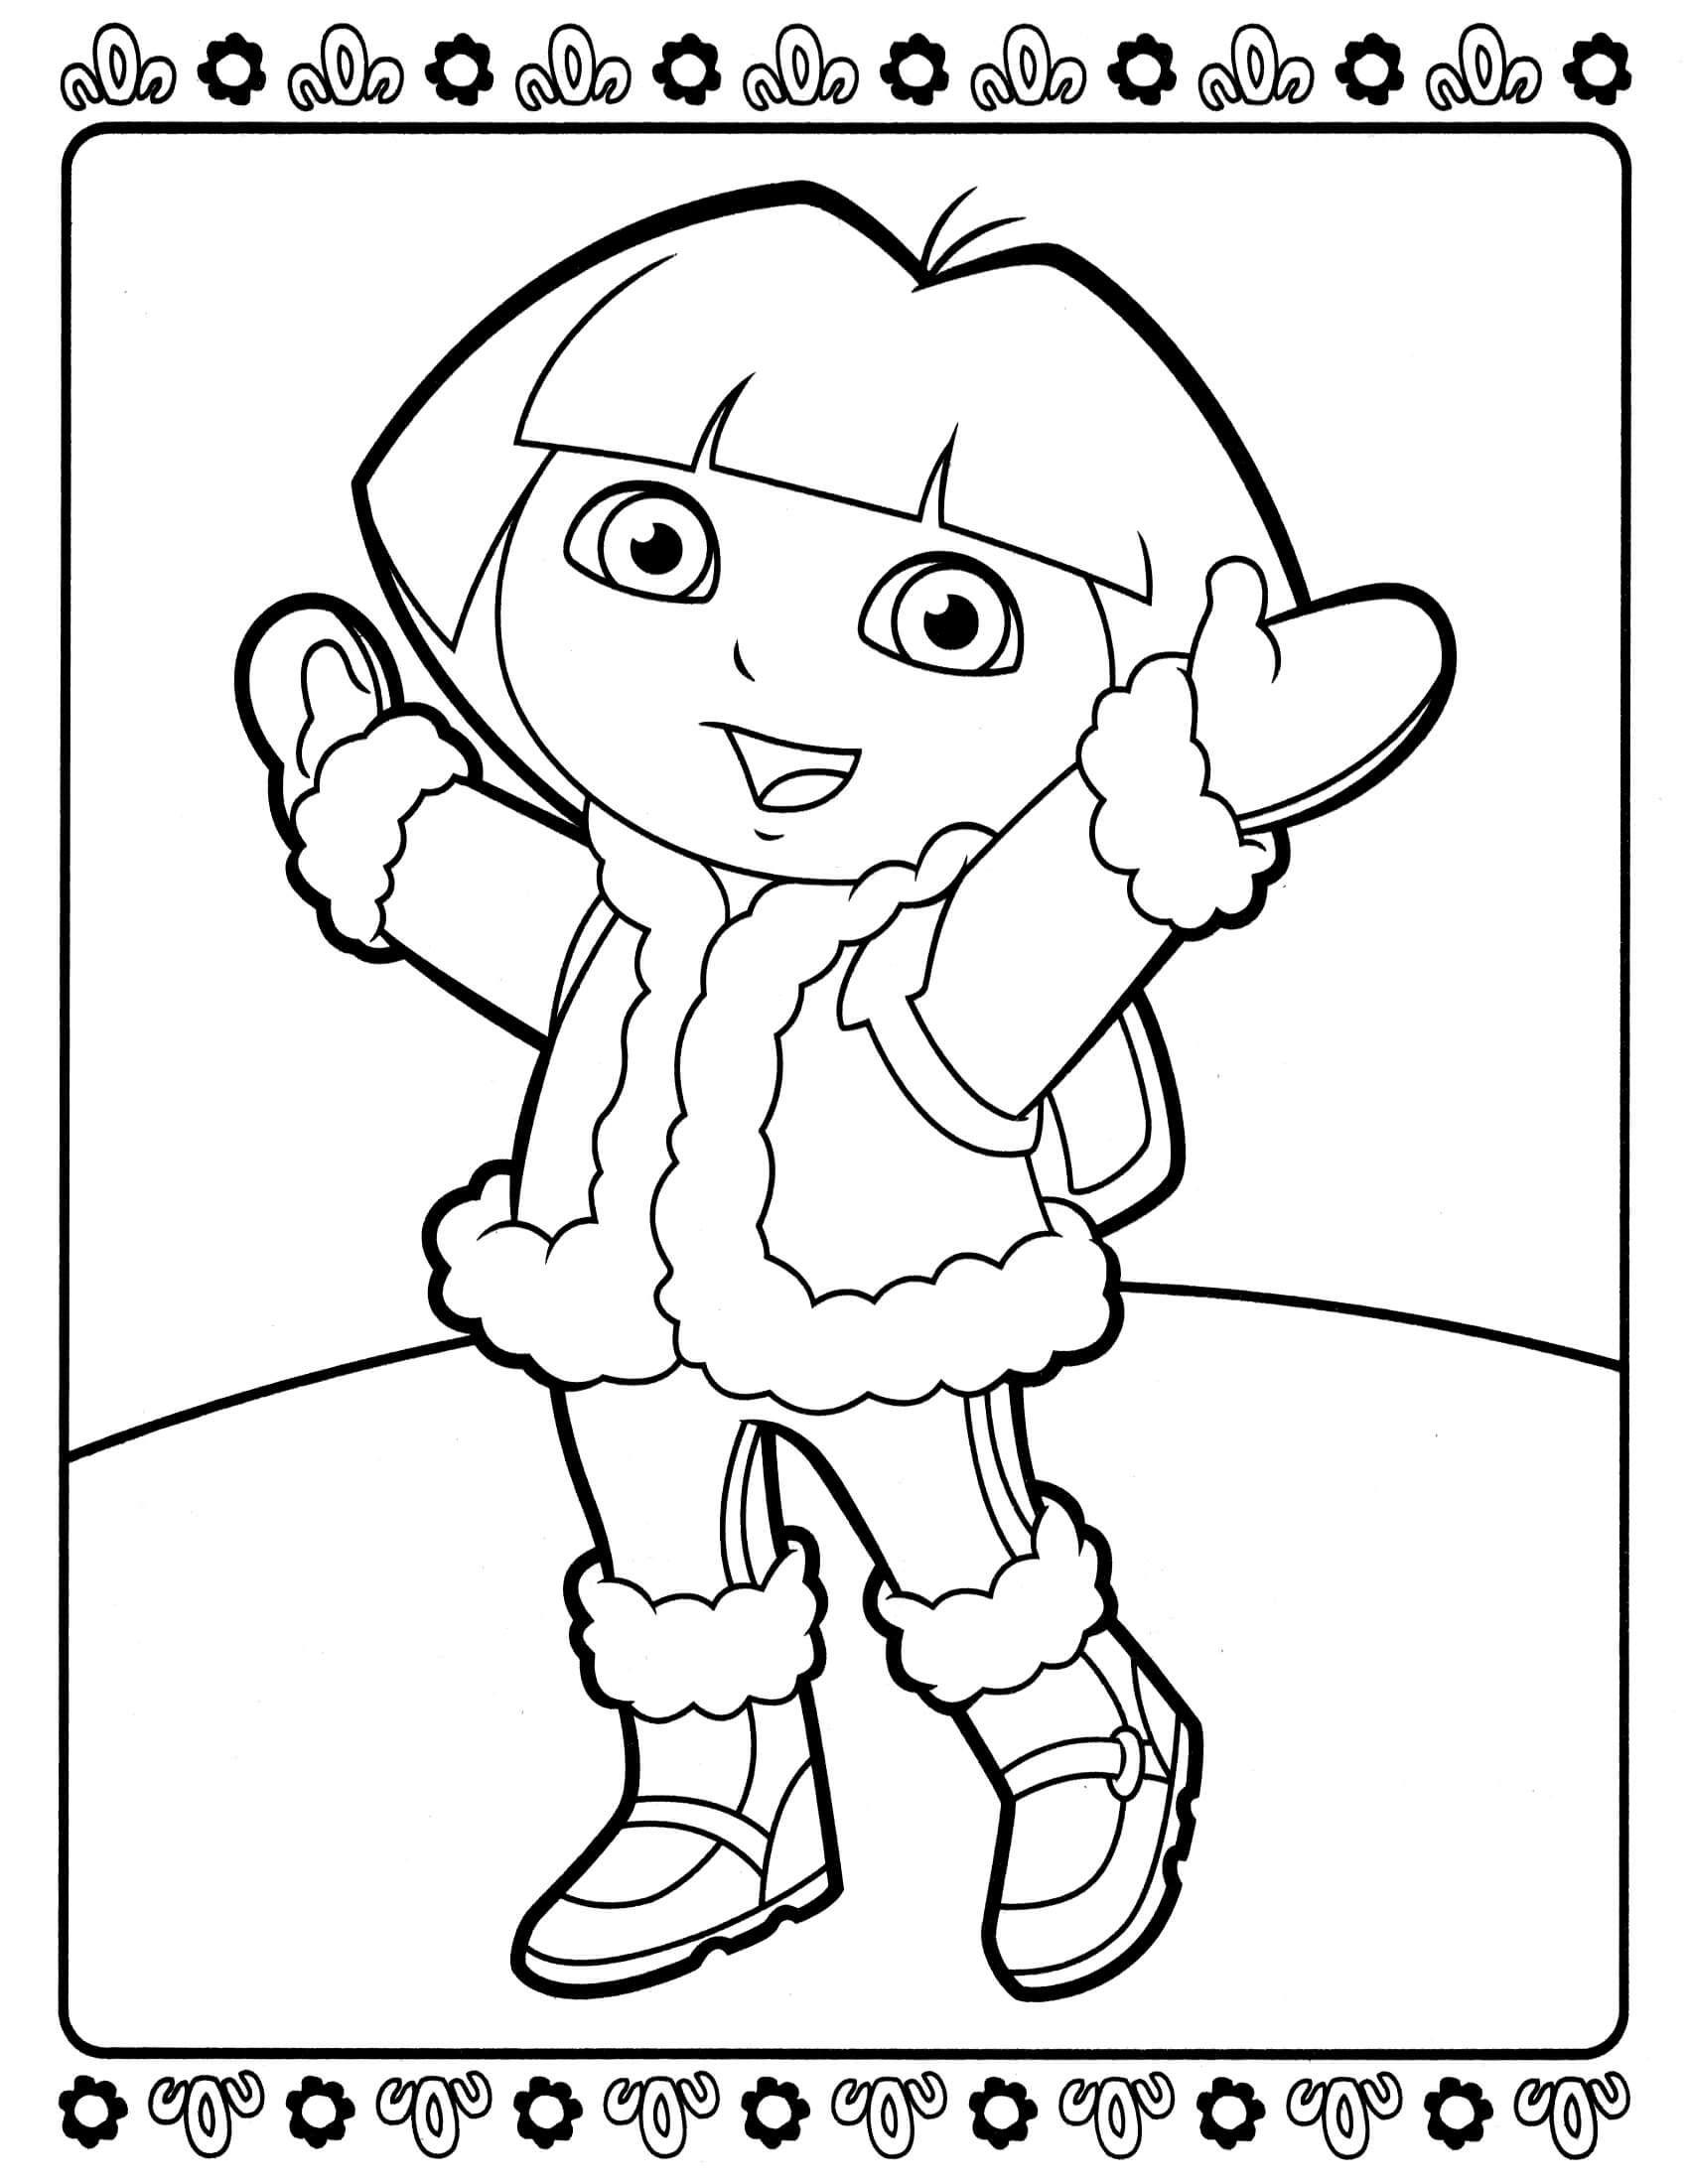 Dora Snow Princess Coloring Pages Princess Coloring Pages Dora Coloring Coloring Pages